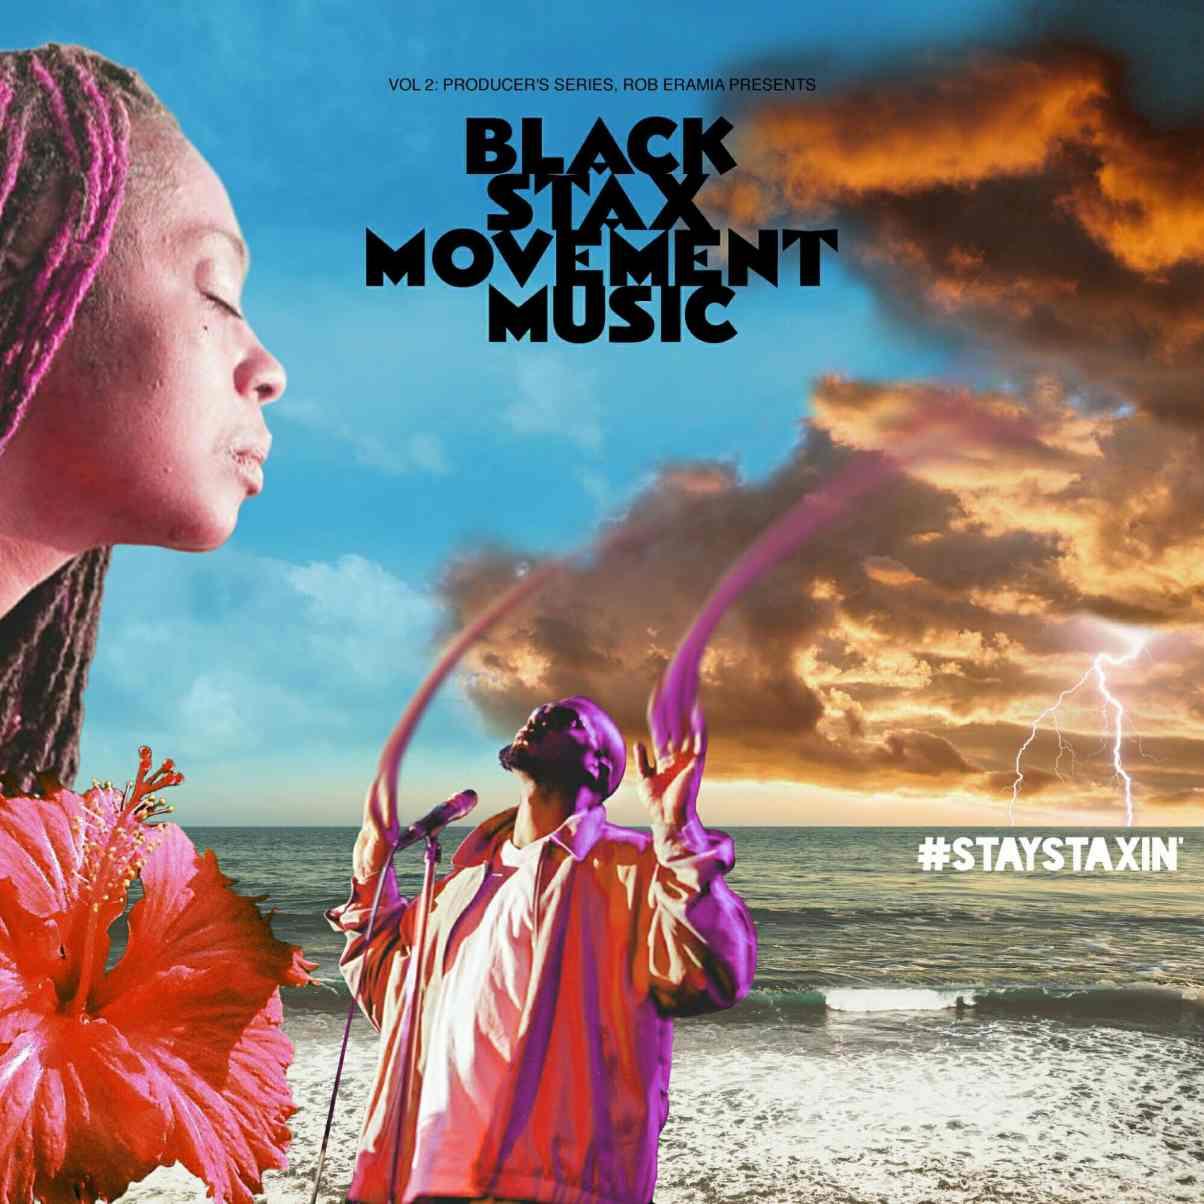 Black Stax EP Movement Music